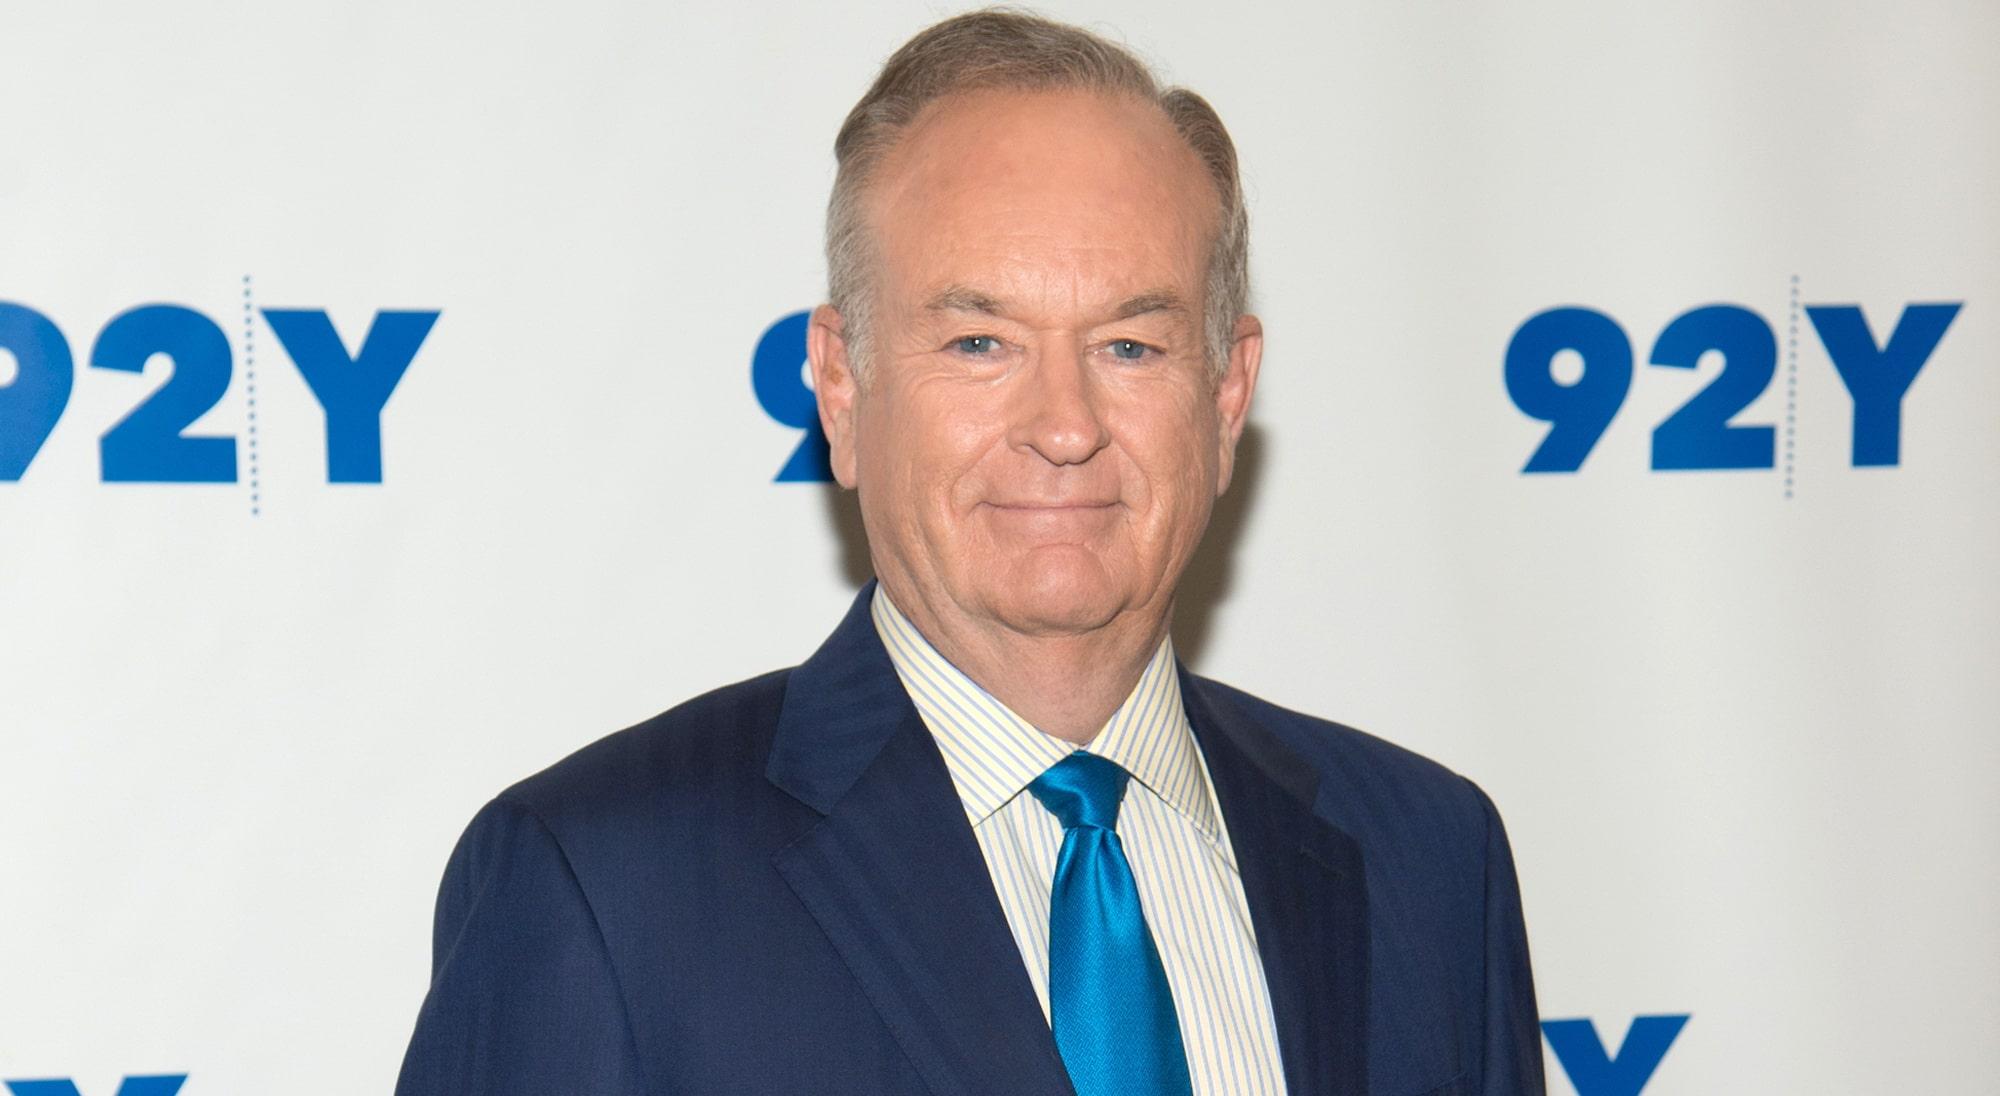 Bill parcells celebrity net worth